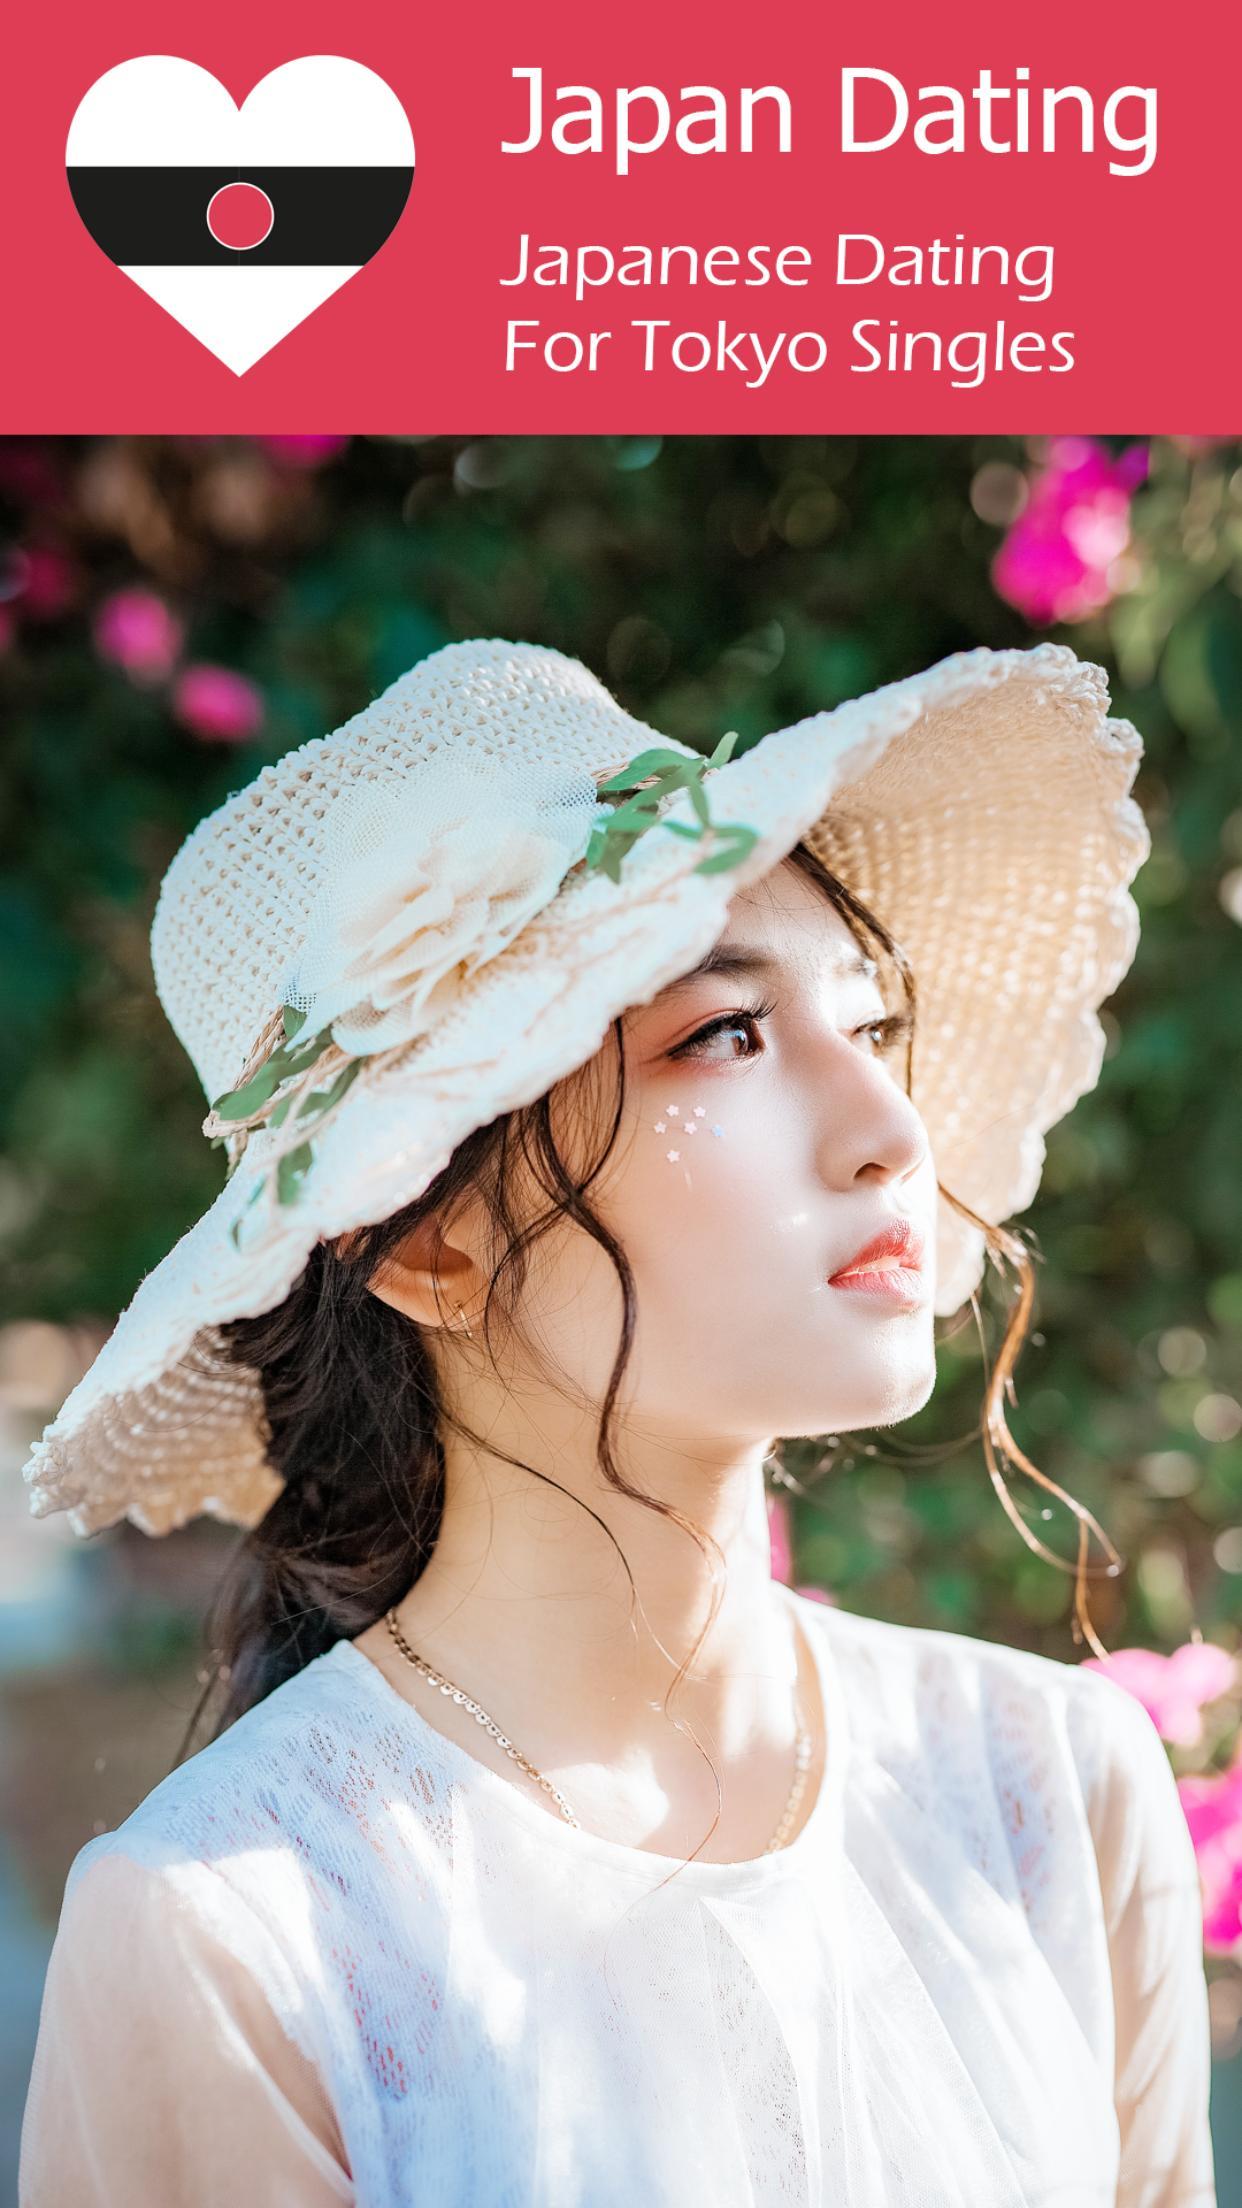 Japanese singles dating single women over 50 dating